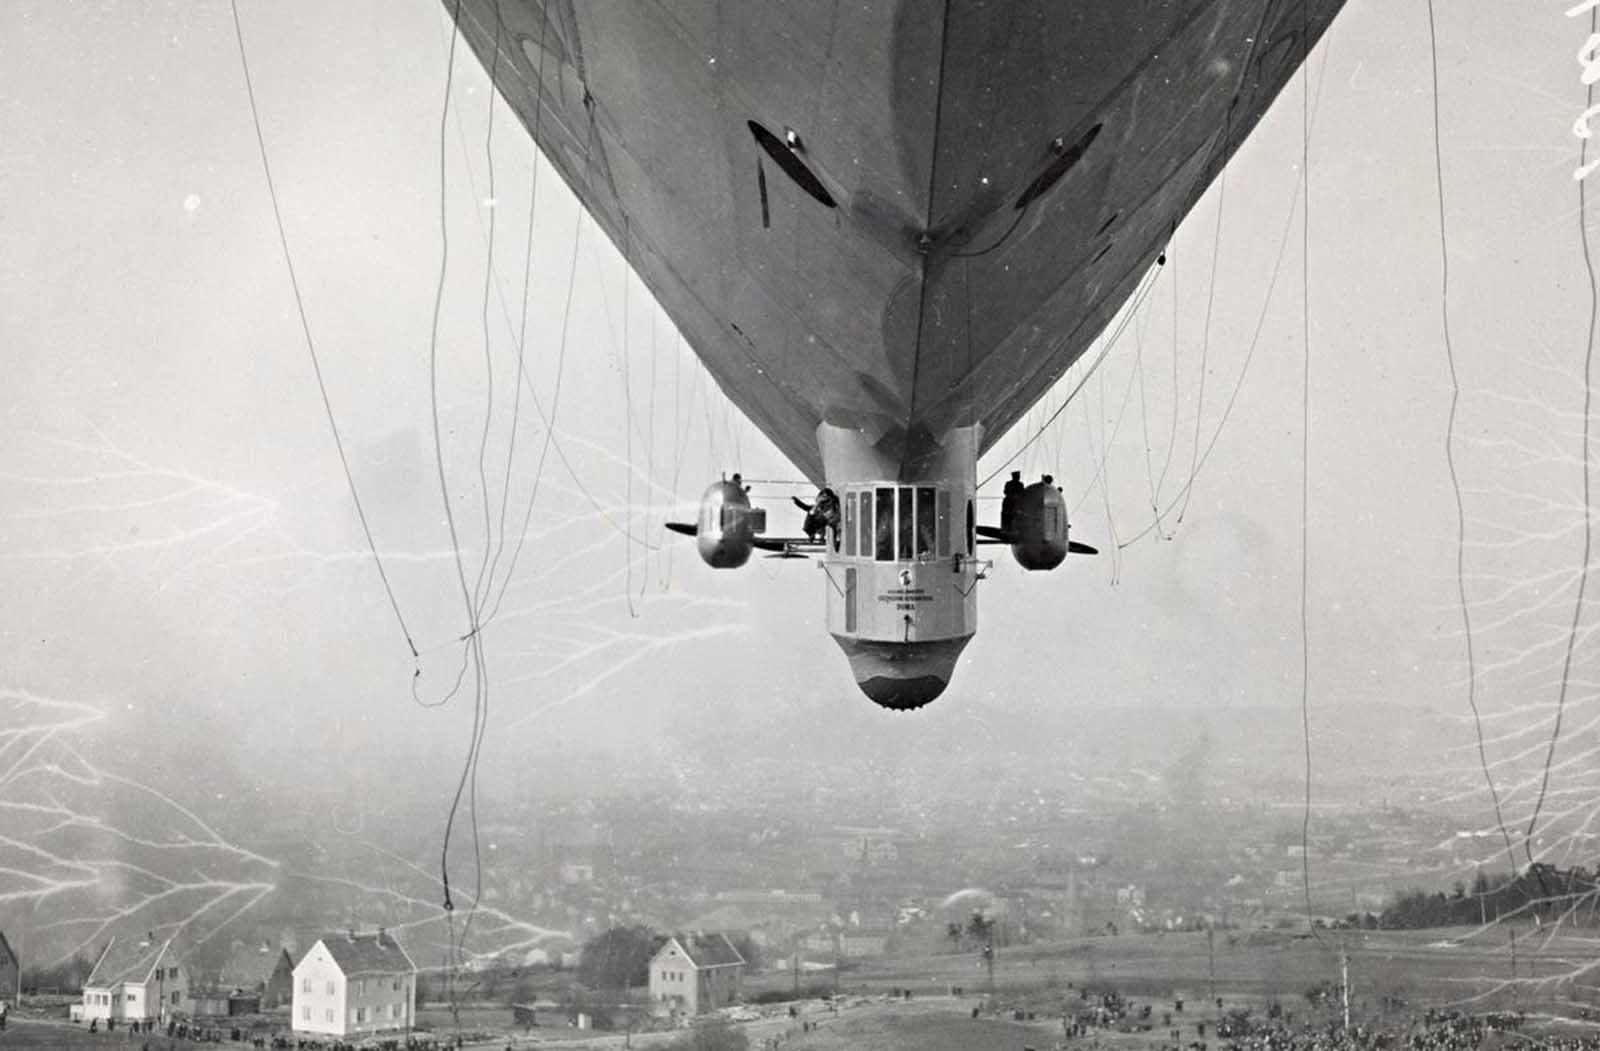 Luftskipet (airship)